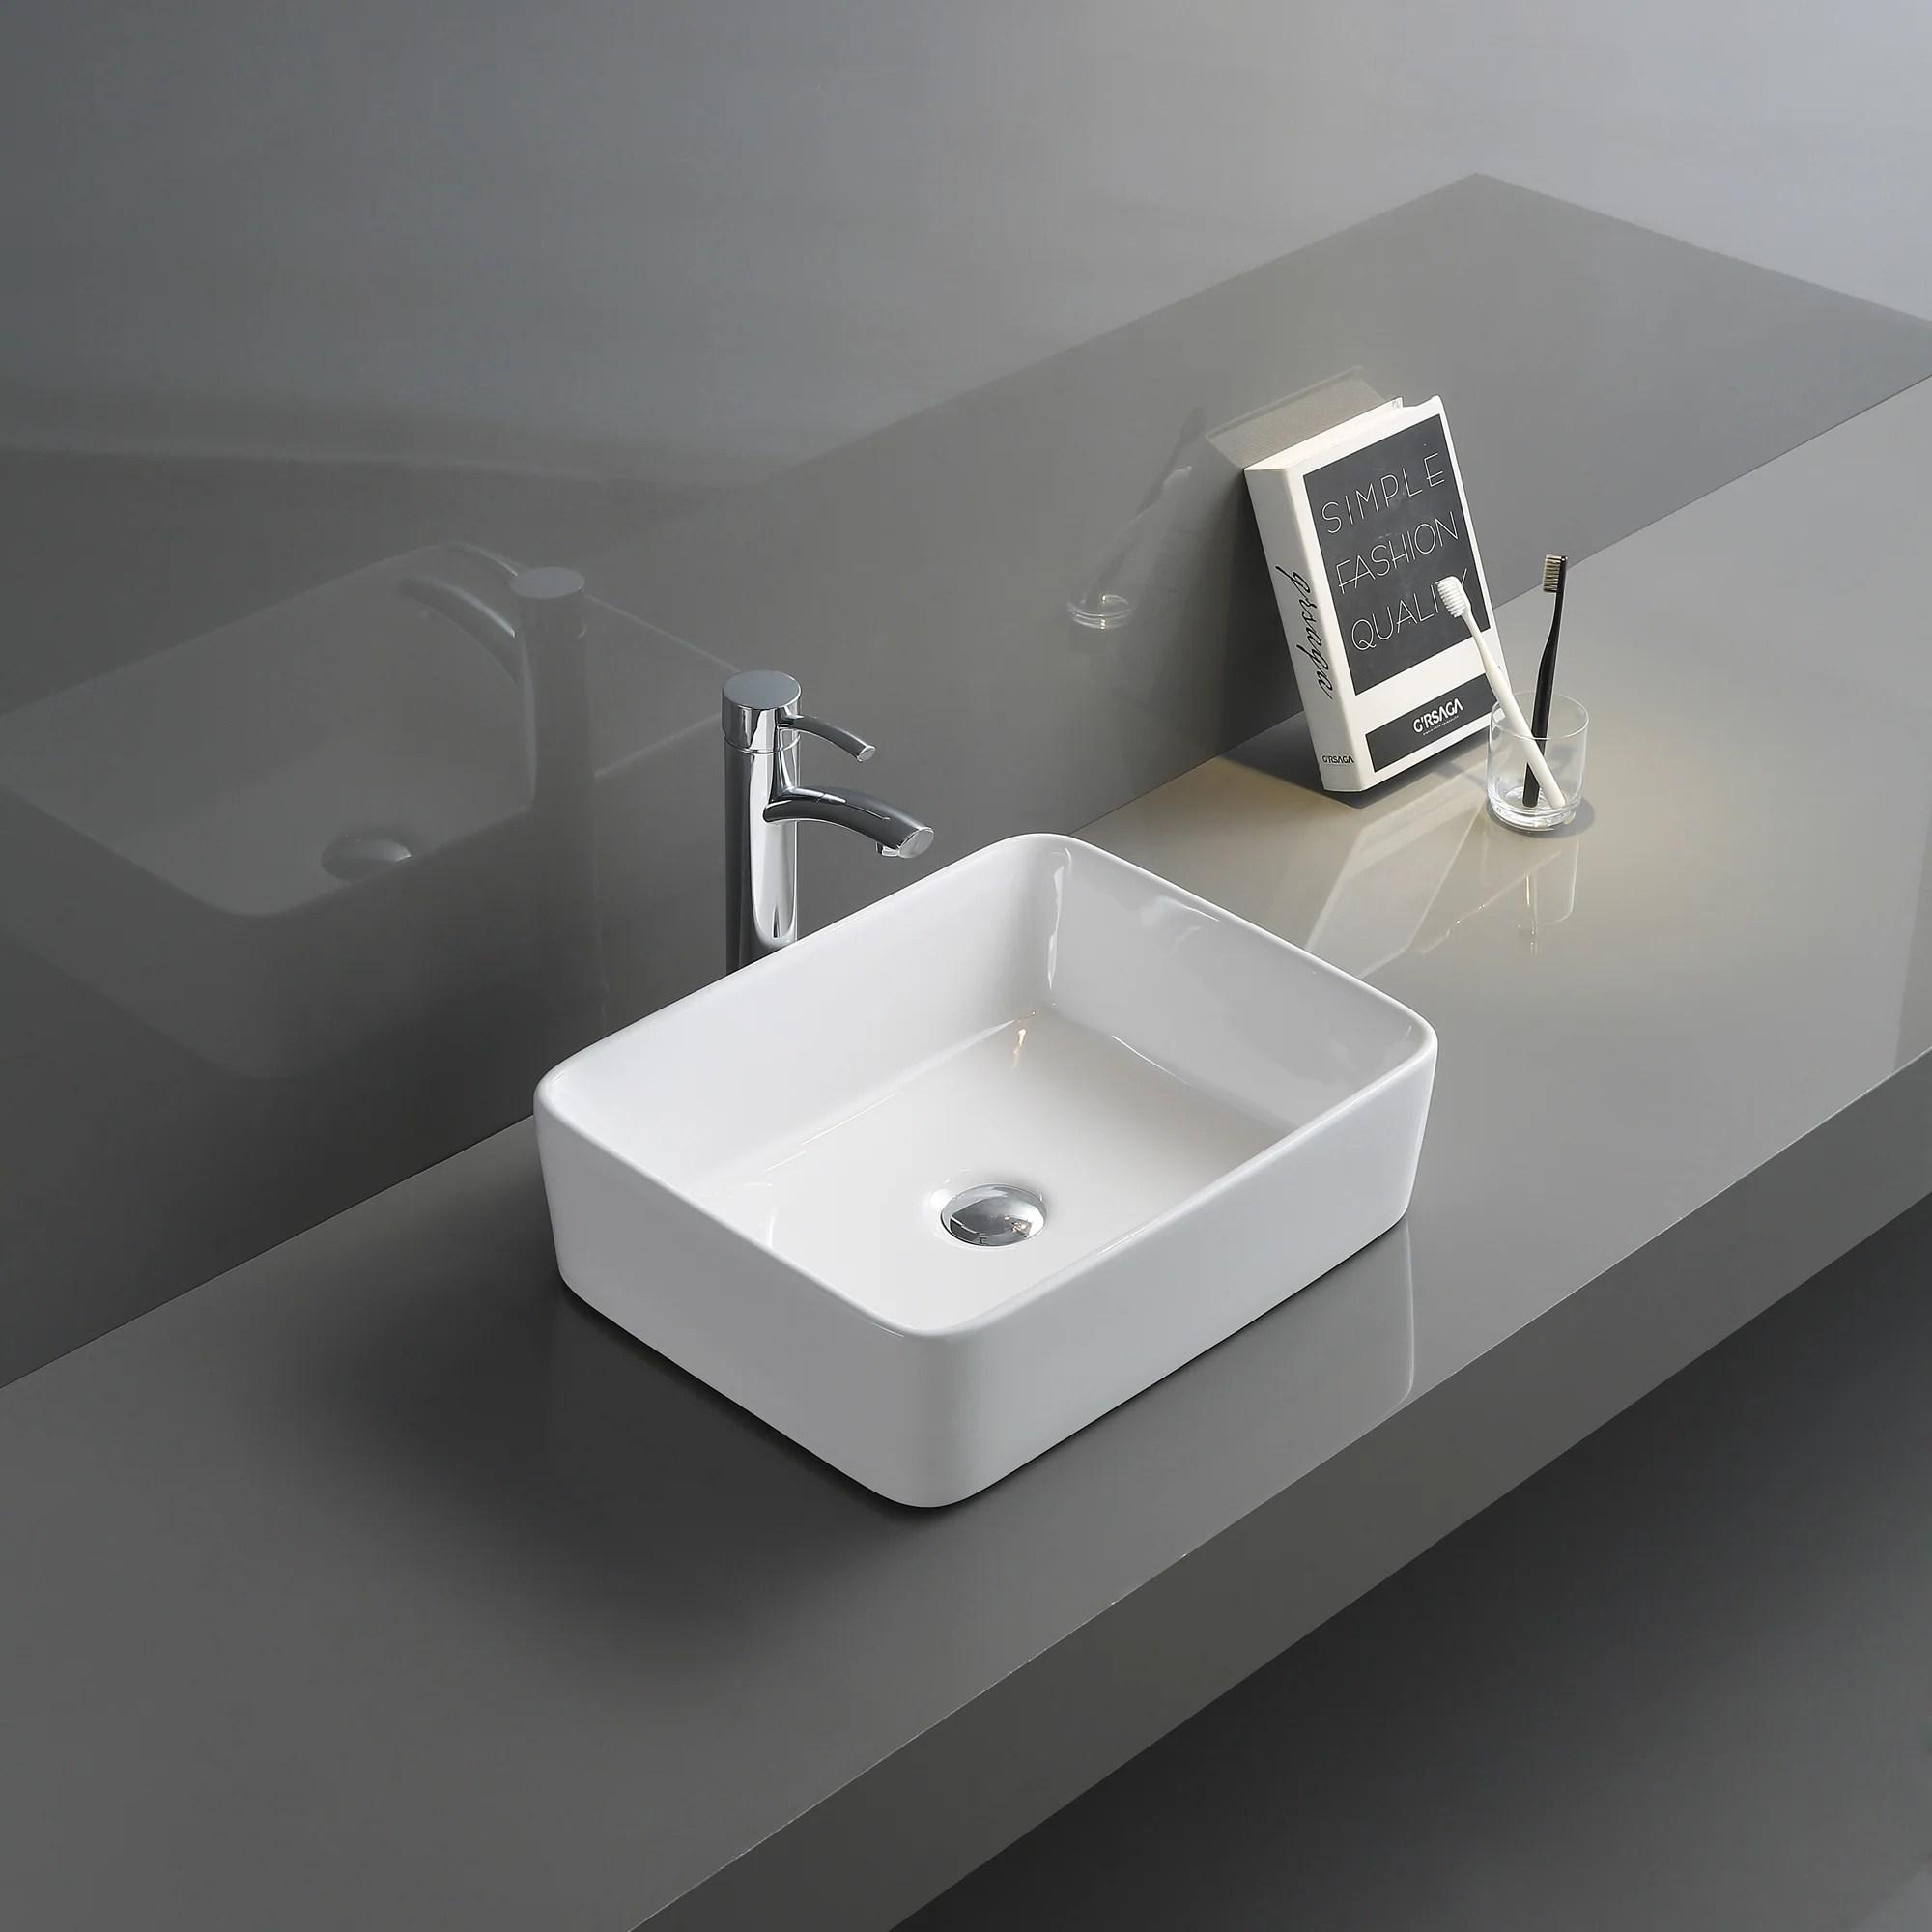 ruvati 19 x 14 inch bathroom vessel sink white rectangular above vanity counter porcelain ceramic